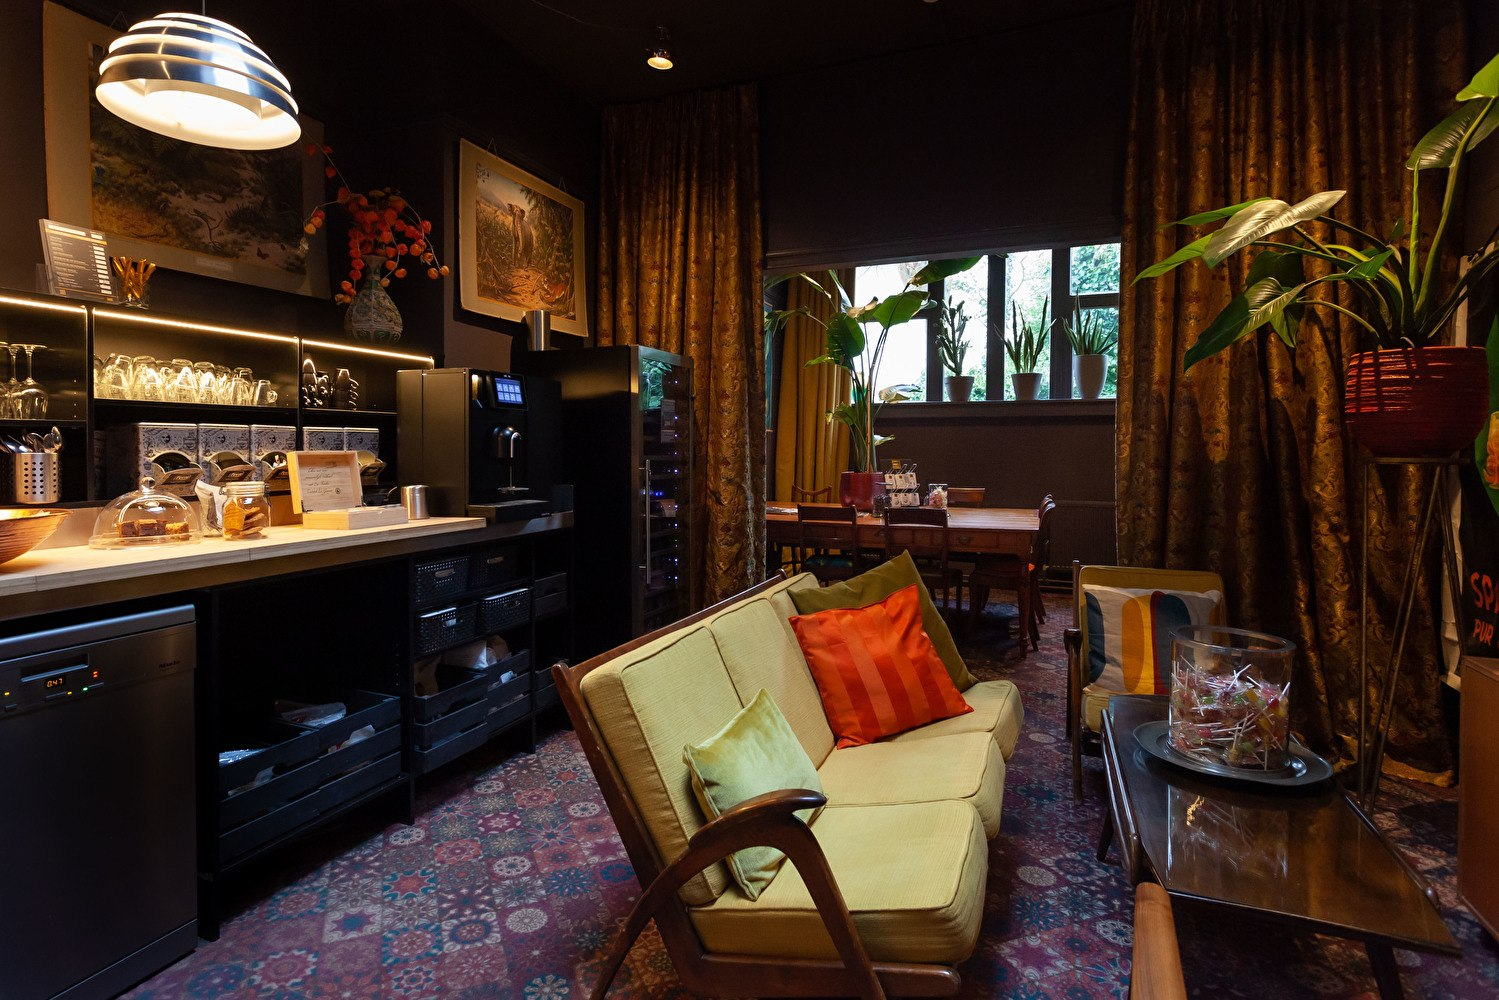 Hotel Staats Haarlem honesty bar